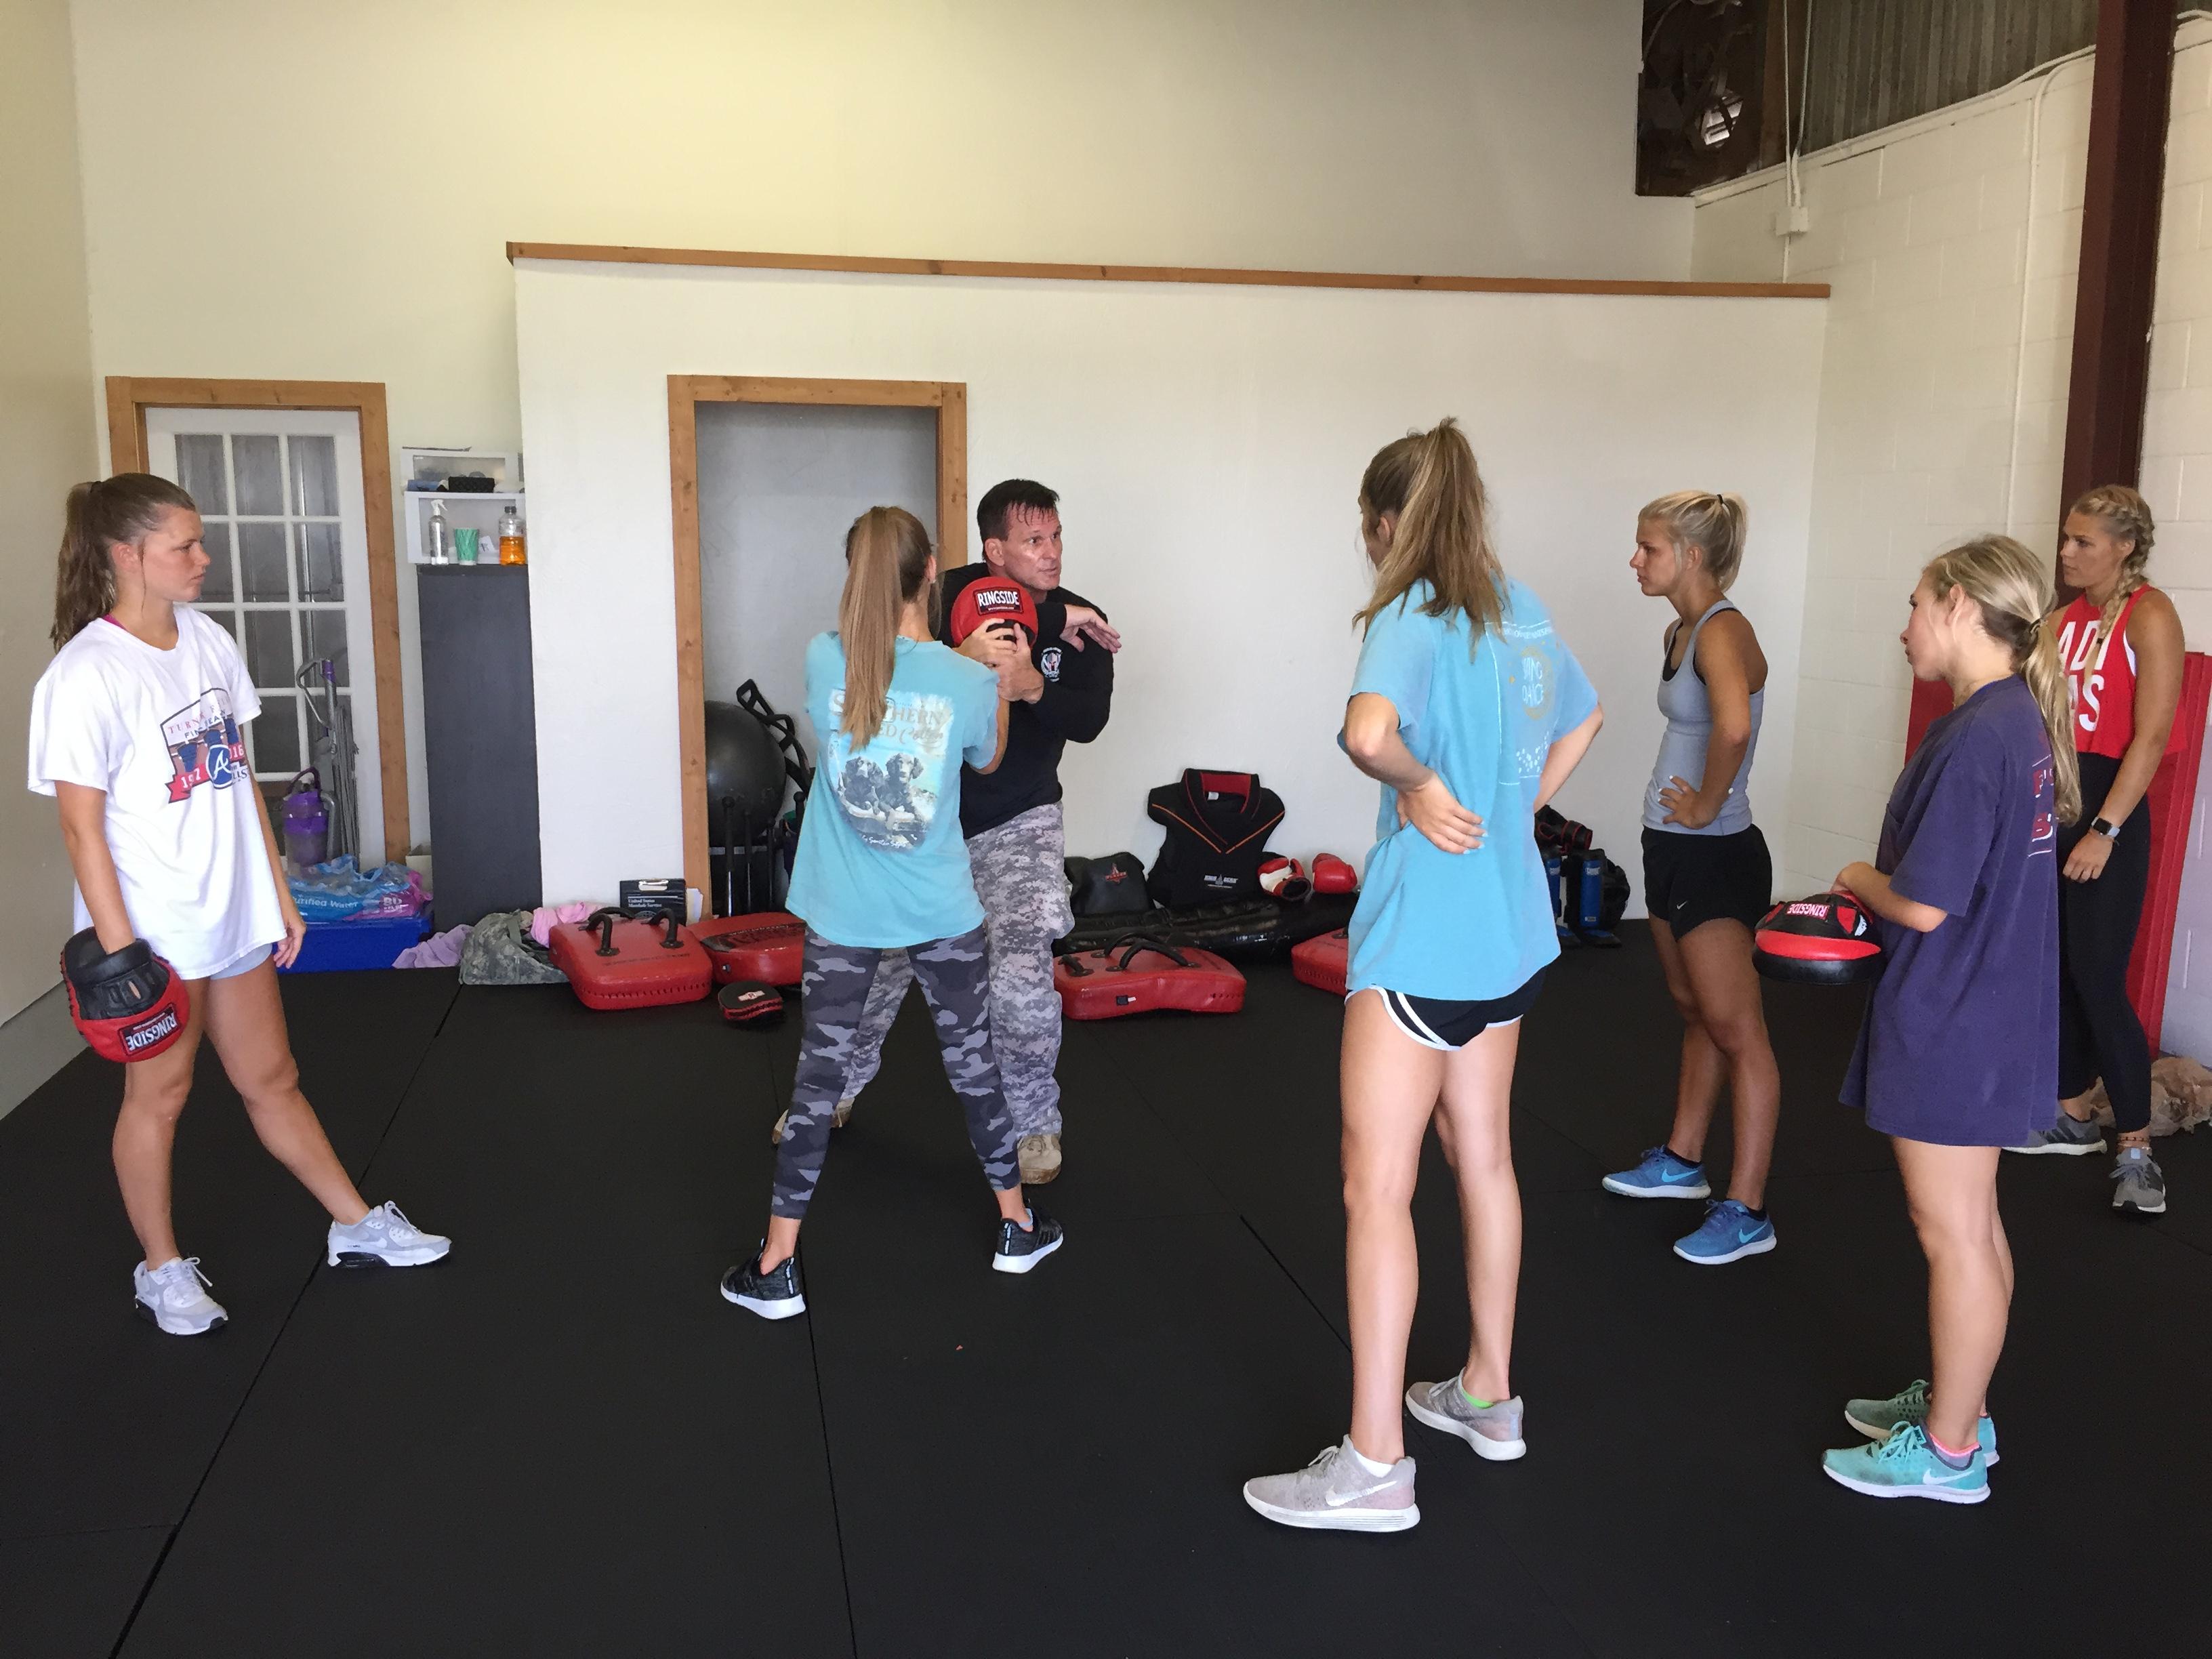 Women's 6 Week Self-Defense Course - Women's Self-Defense Series | ©2018 Charlie Moore Training - www.charliemooretraining.com